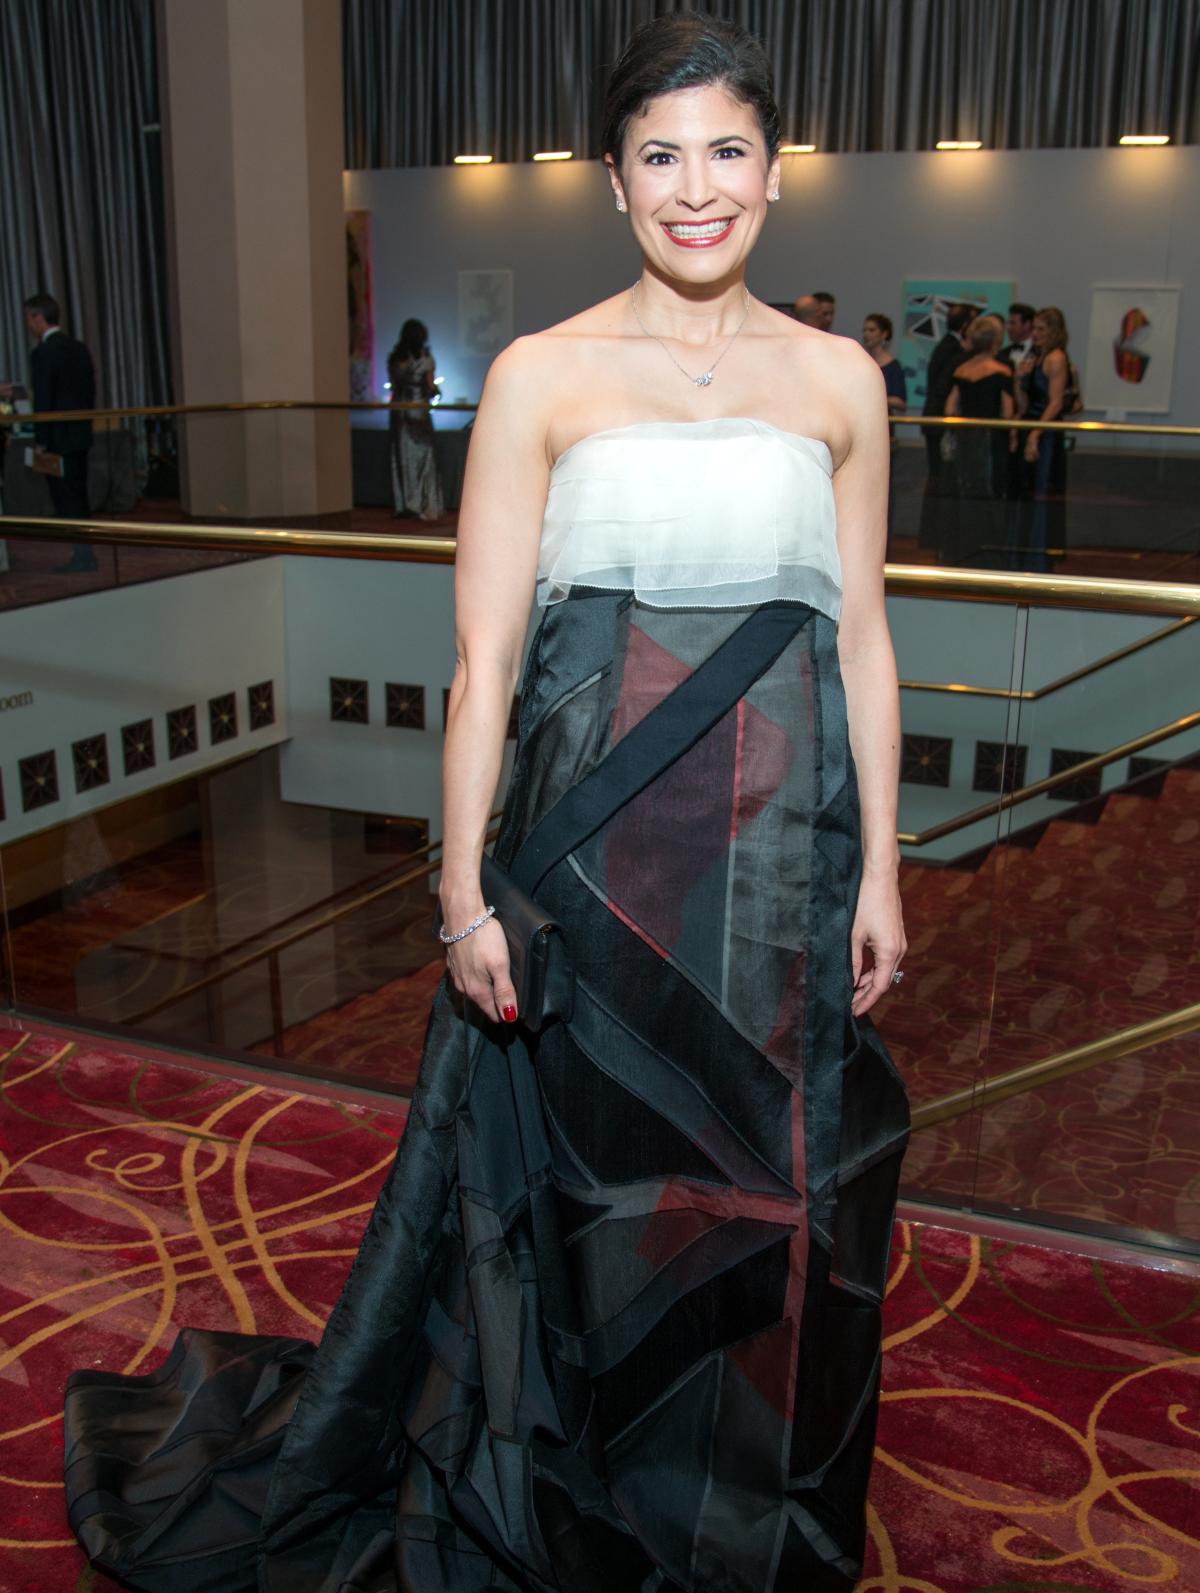 Houston, Ballet Ball gowns, Feb 2017, Kristy Bradshaw in Carolina Herrera